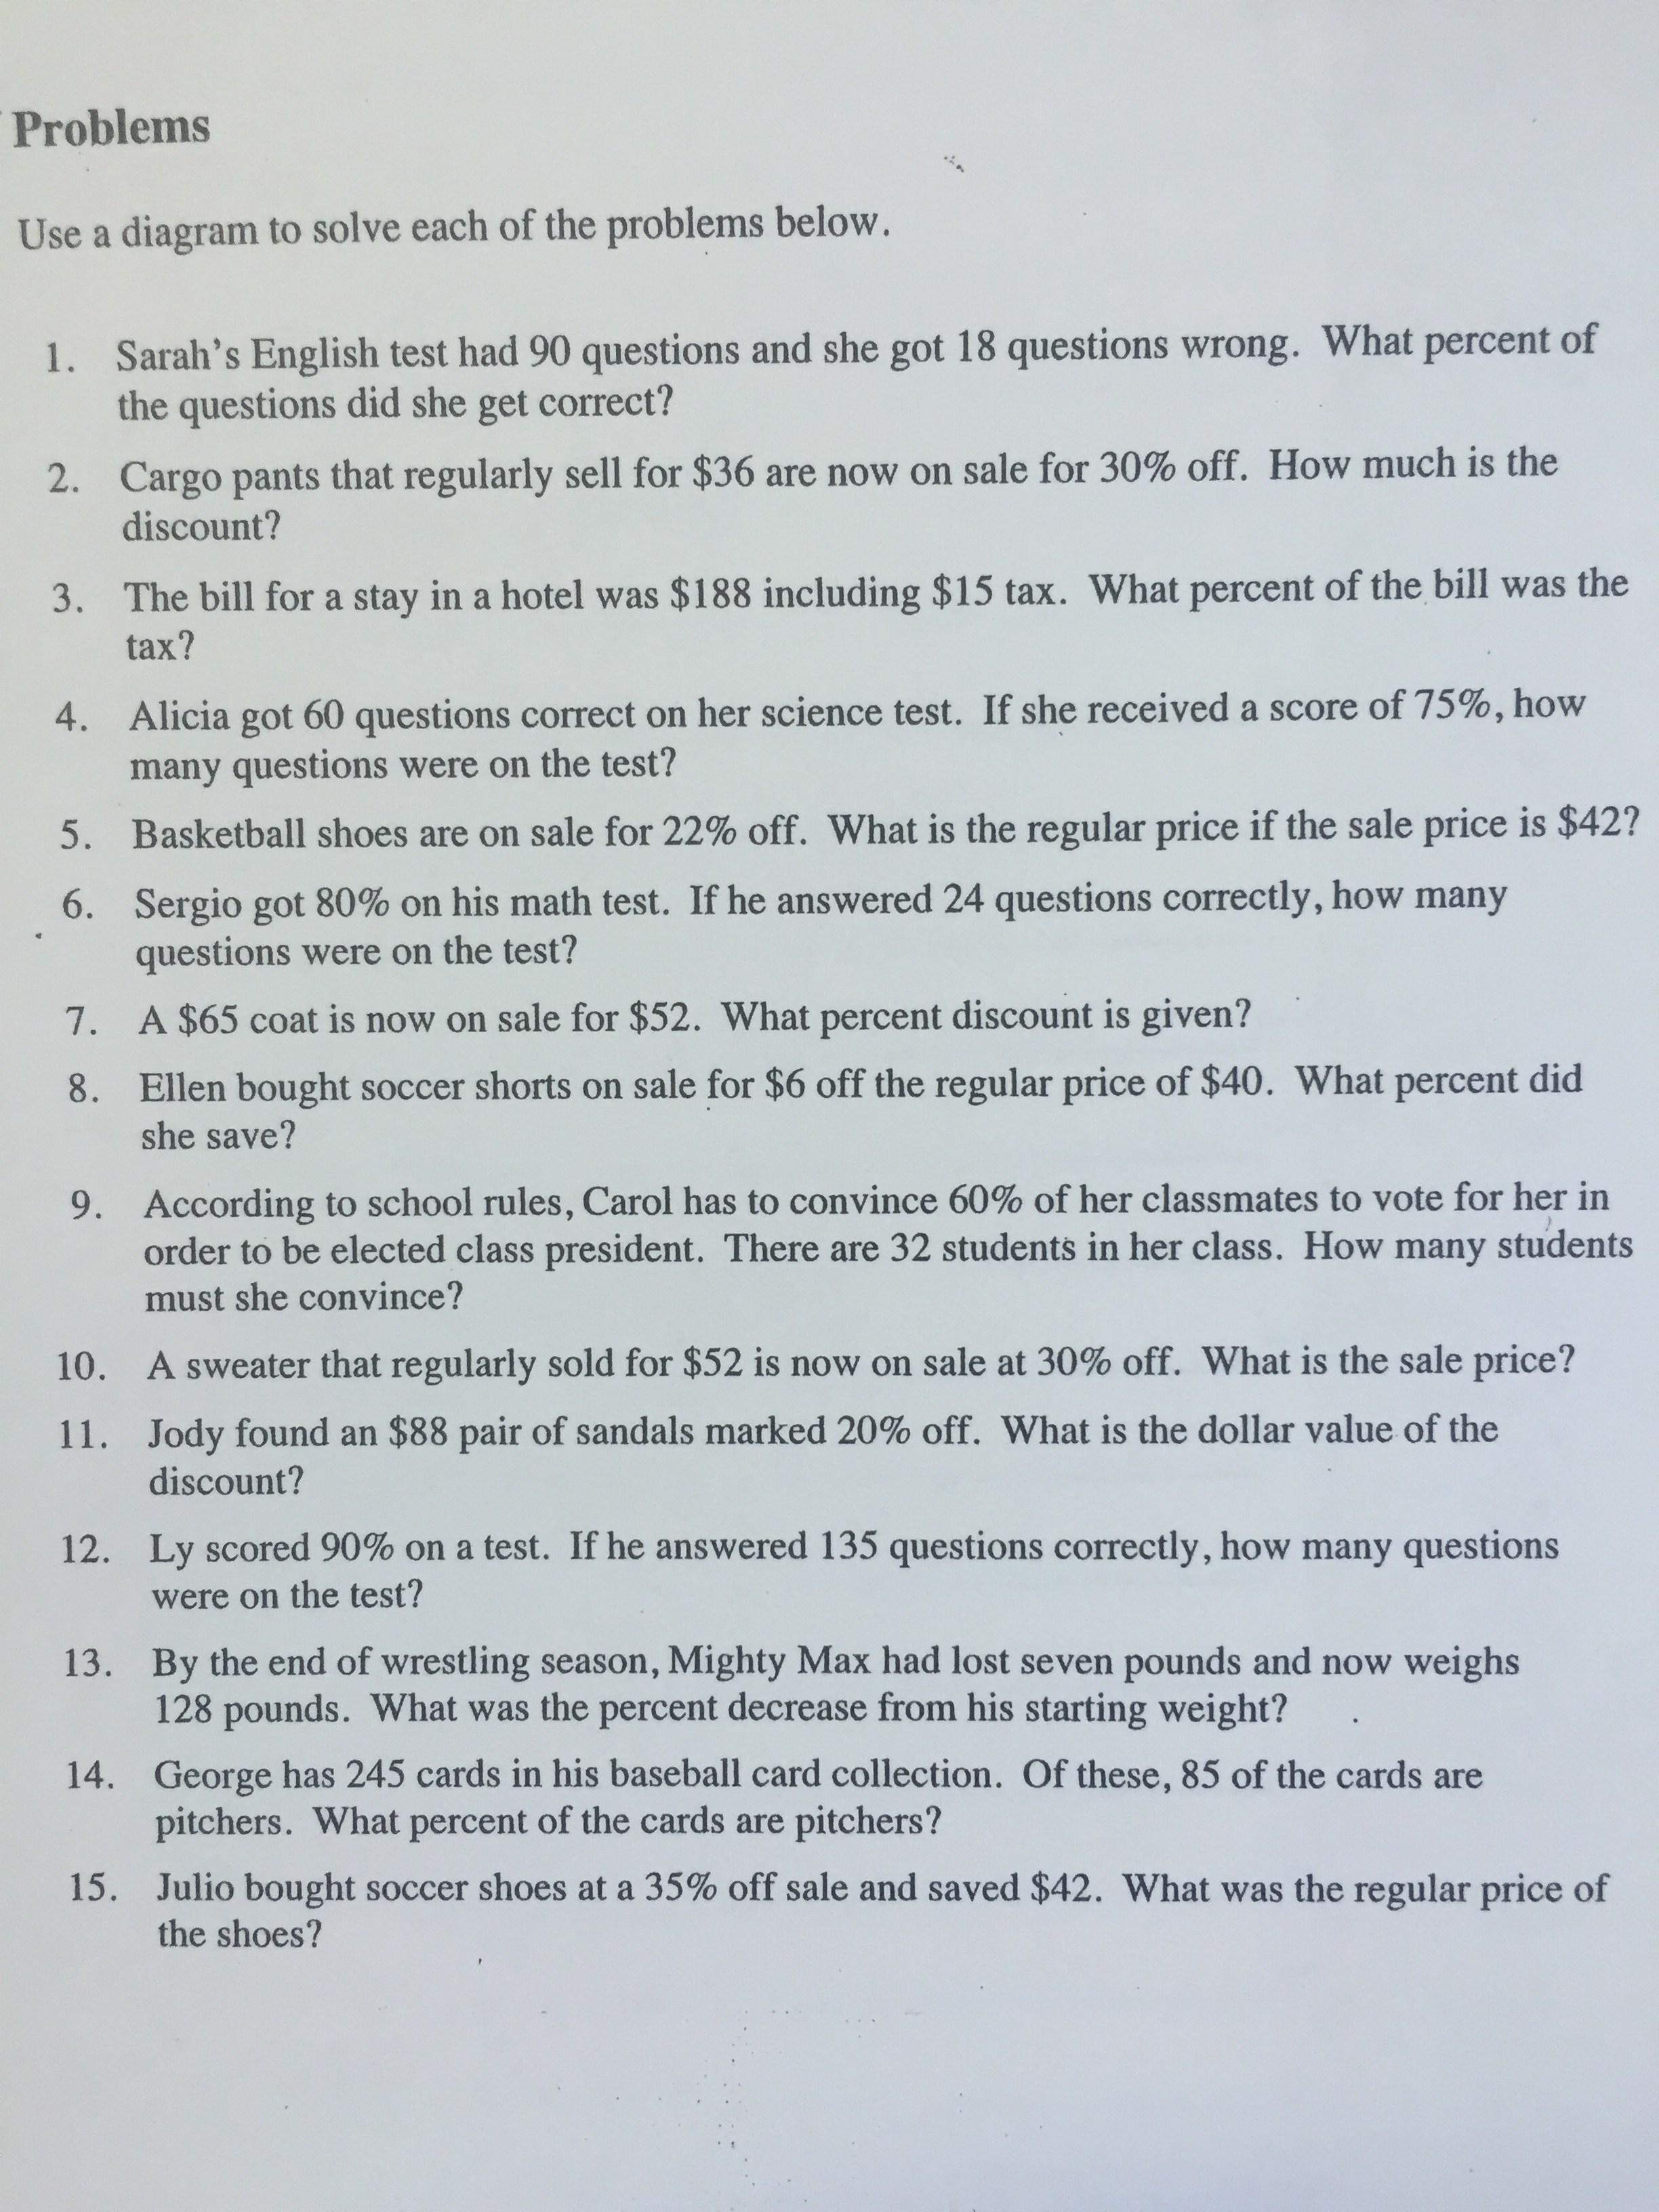 cpm homework help course 3